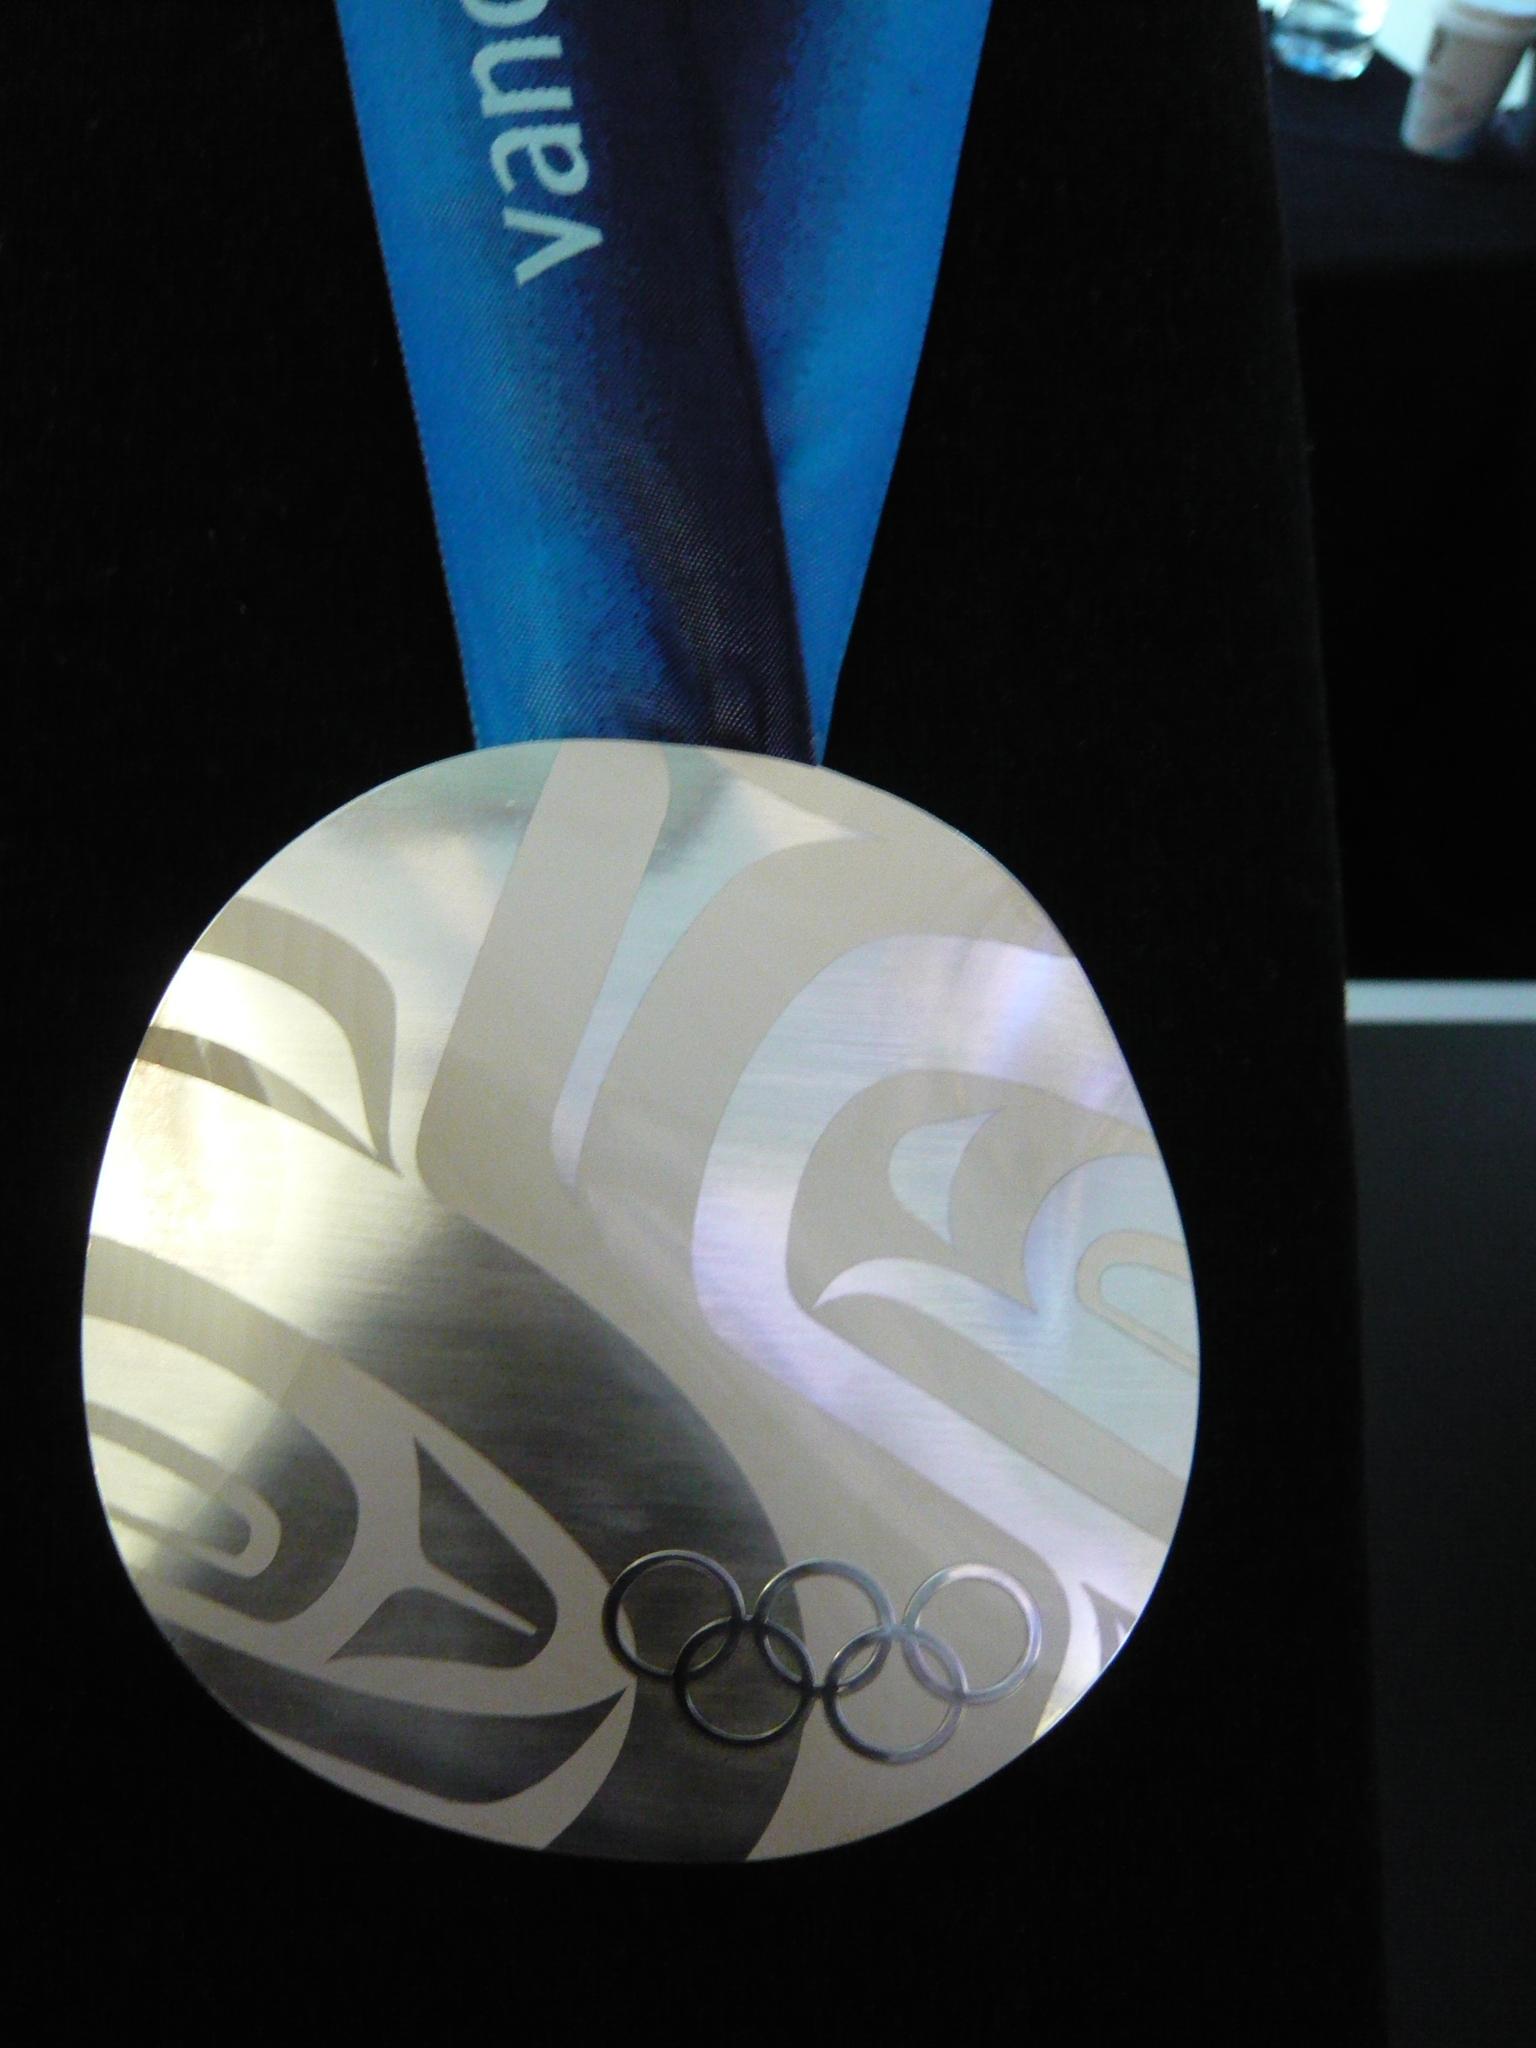 Rio Olympics Discussion